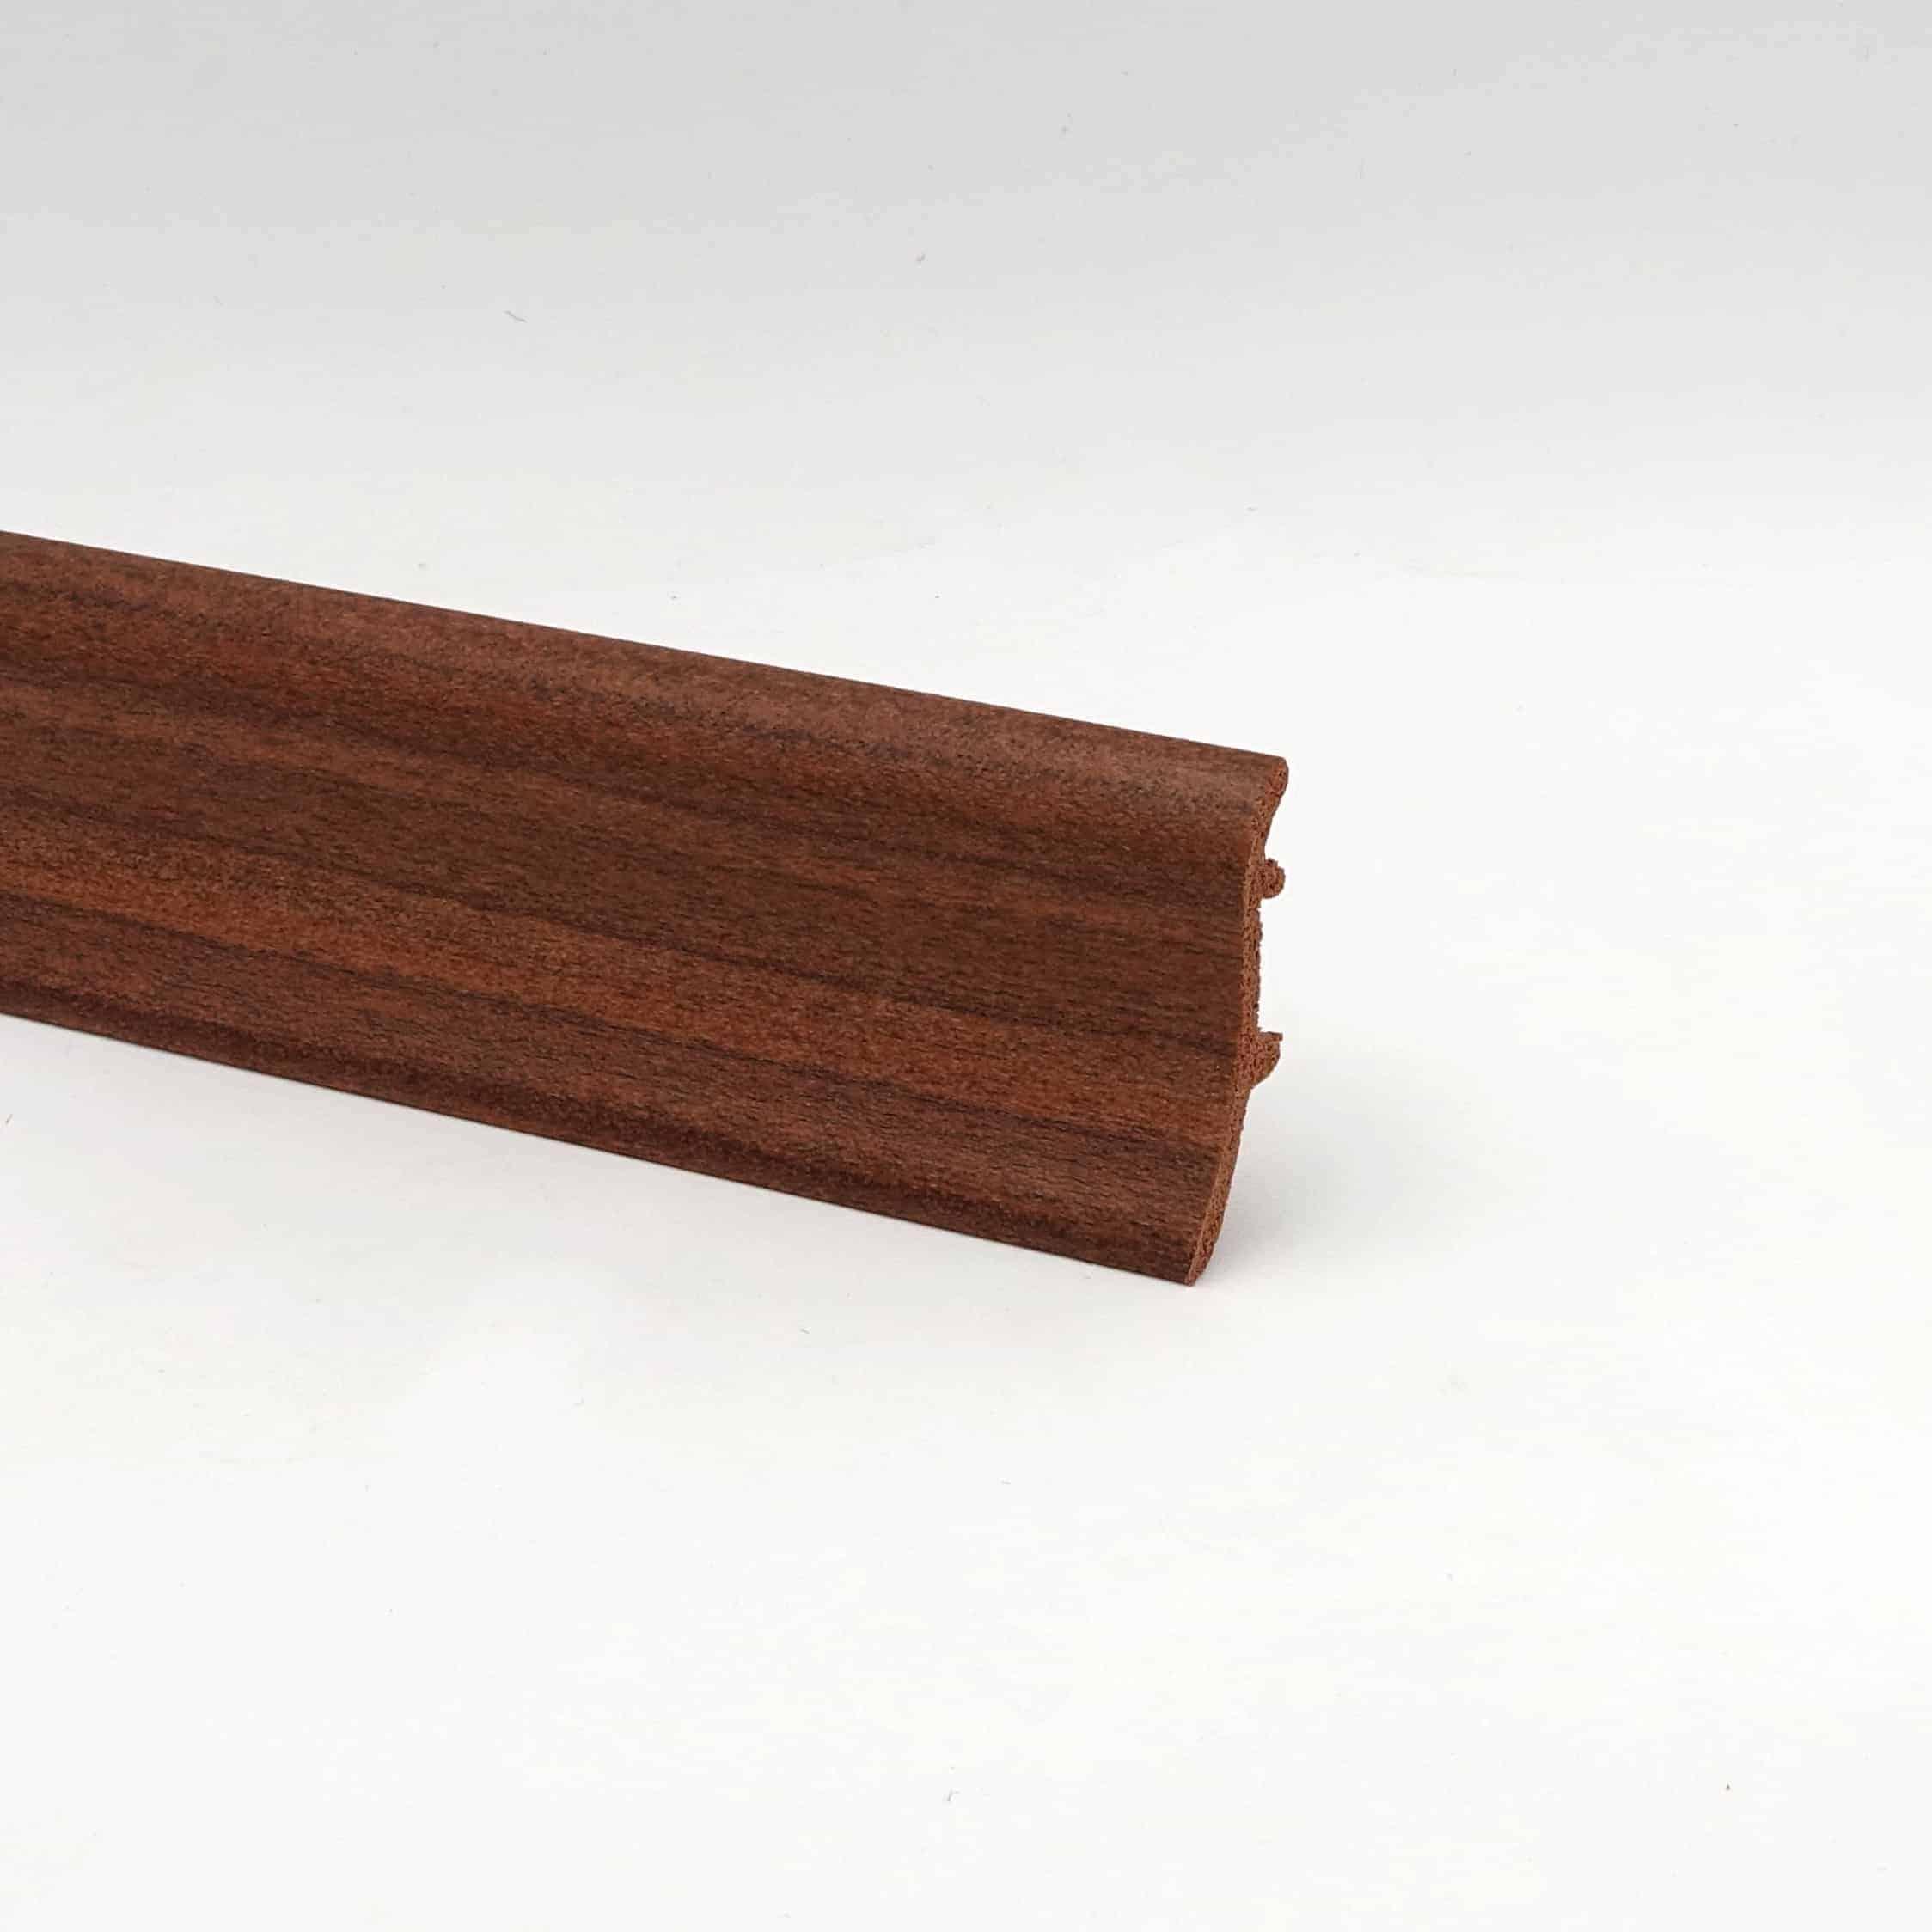 Sockelleiste – Hartschaumleiste in 2,5m Länge